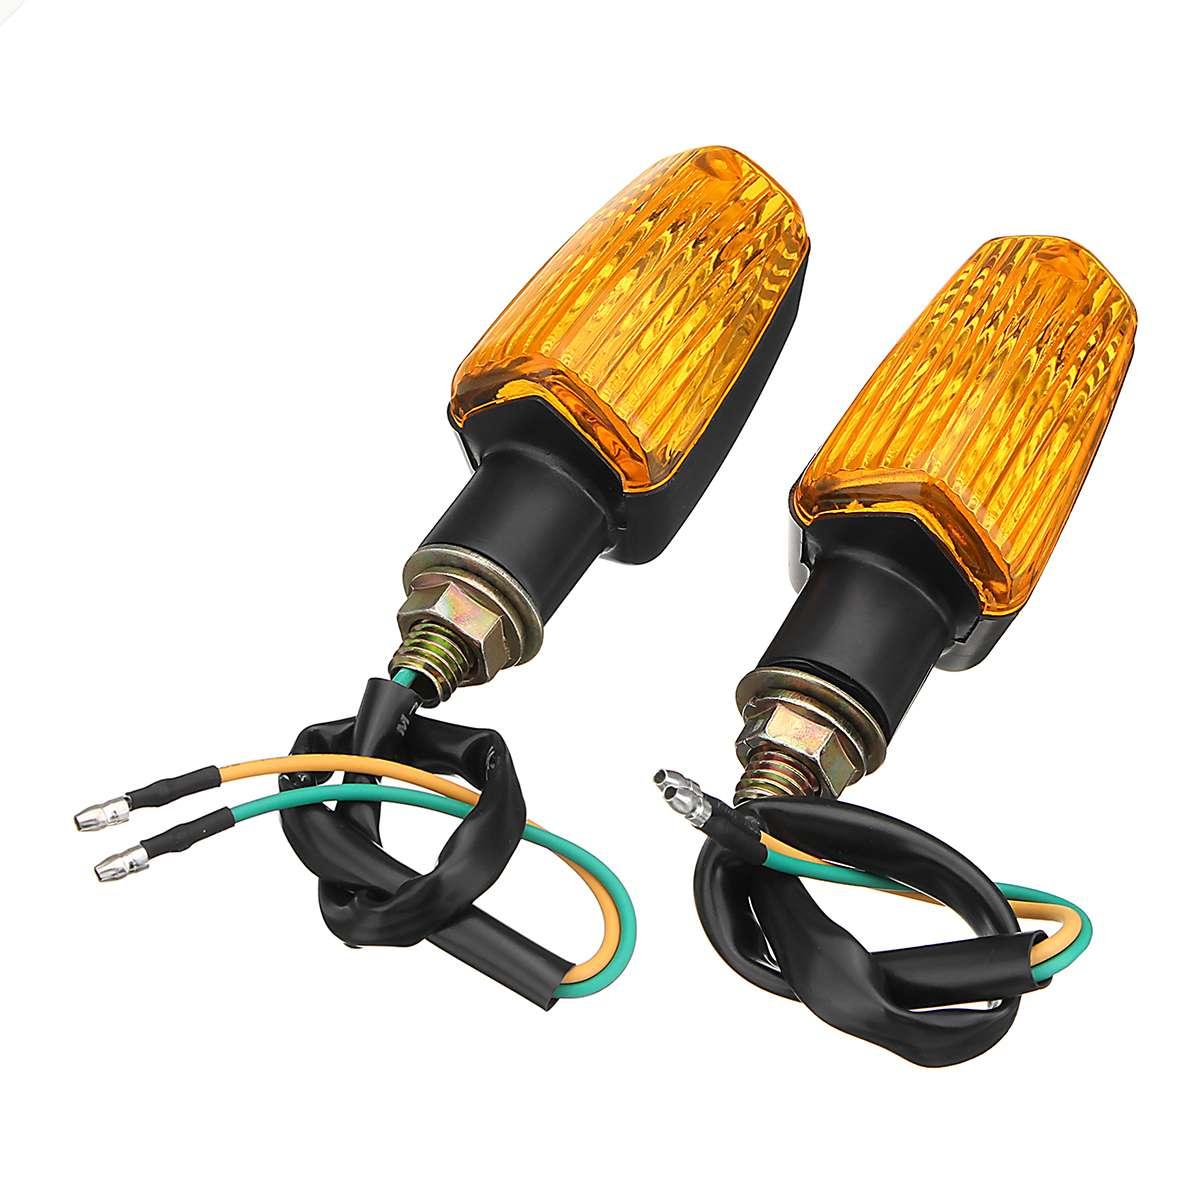 2Pcs Universal For Honda For Kawasaki For Suzuki For Yamaha Flasher Lamp Motorcycle Turn Signal Light Blinker Bulb 12V 10W Amber